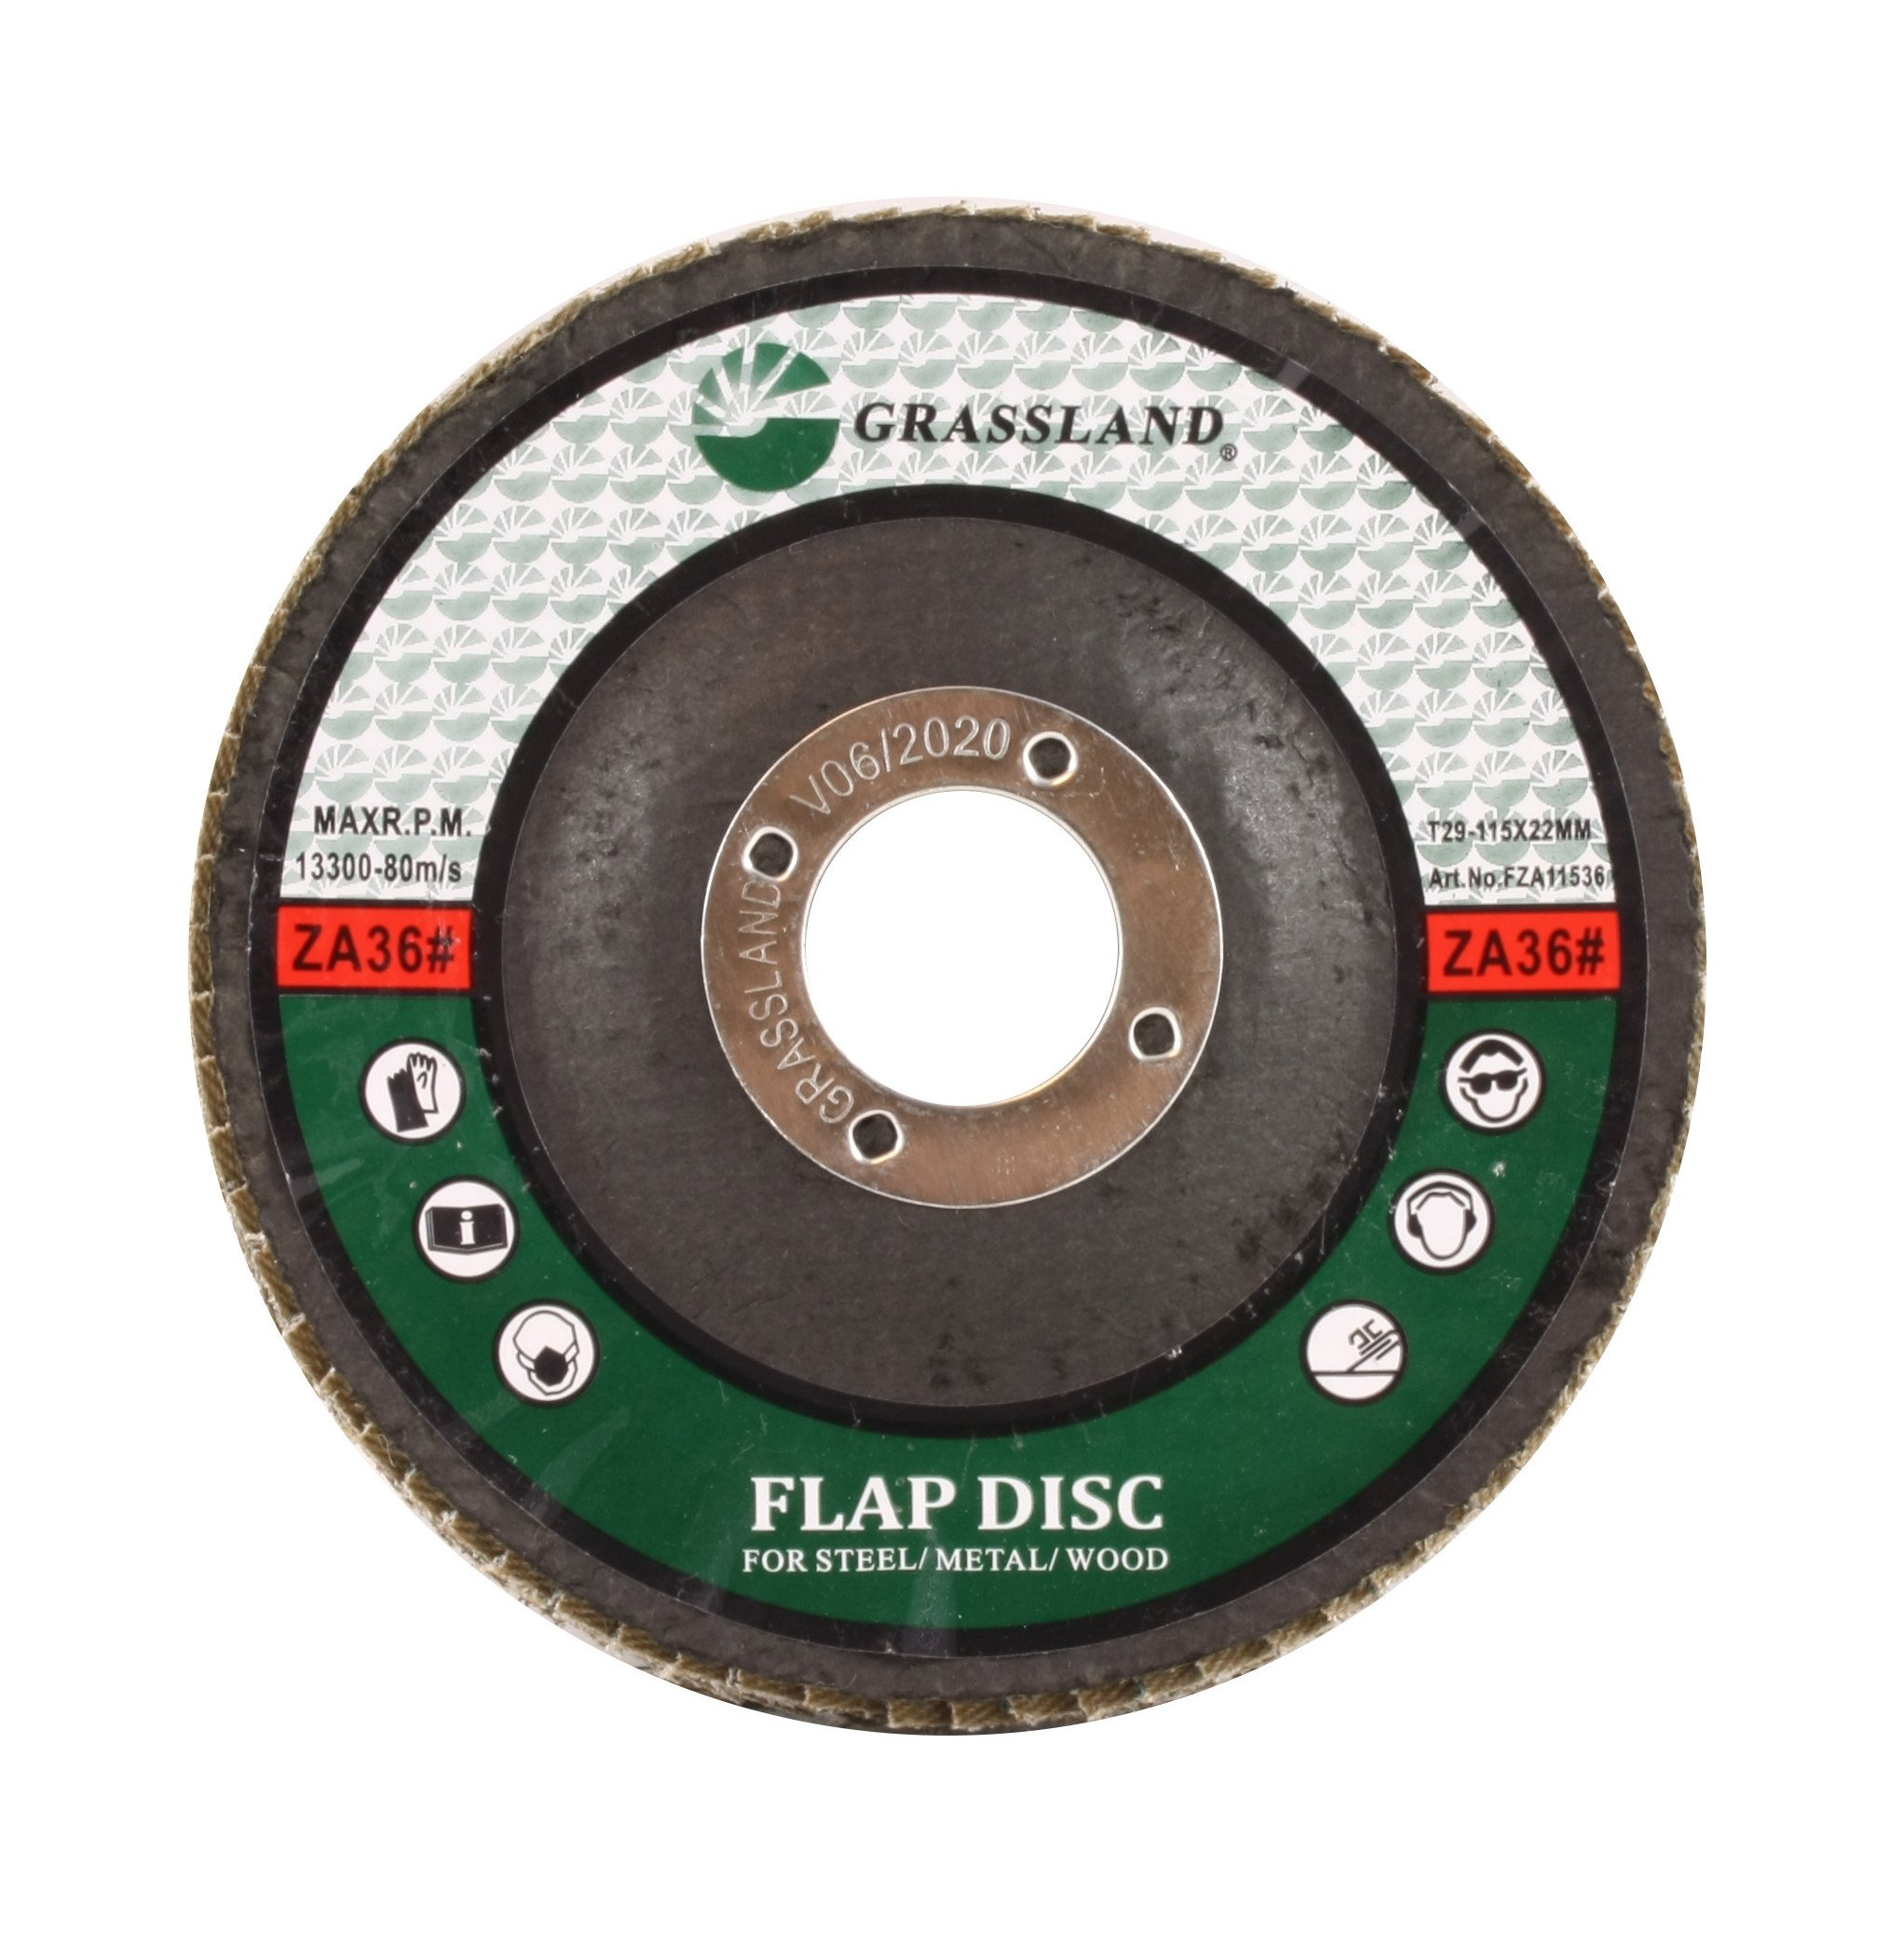 Sanding Disc, Zirconium Flap Disc, Grinding Wheel 4-1/2'' x 7/8'' 36 Grit - T29 - (25 Pack)